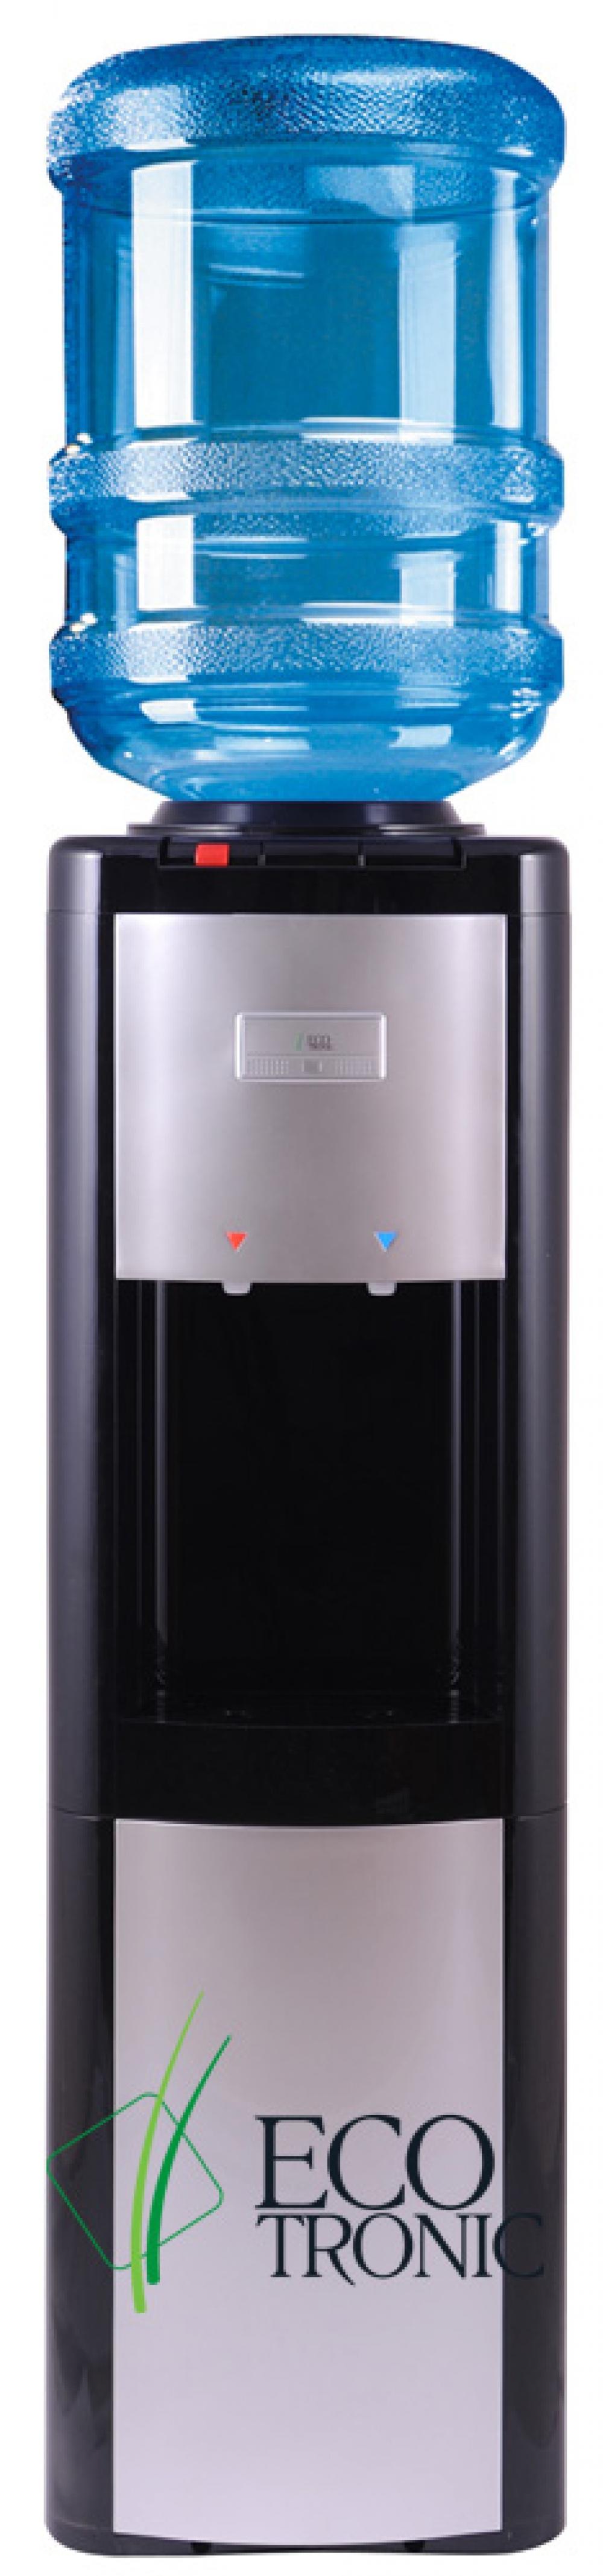 Ecotronic P4-L black/silver